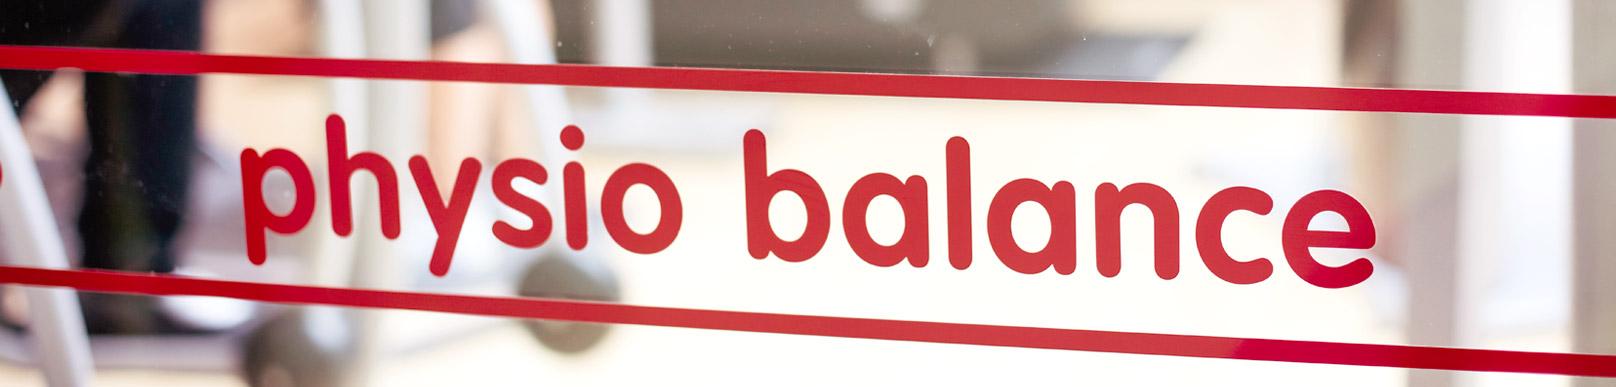 physiobalance Logo im Fenster